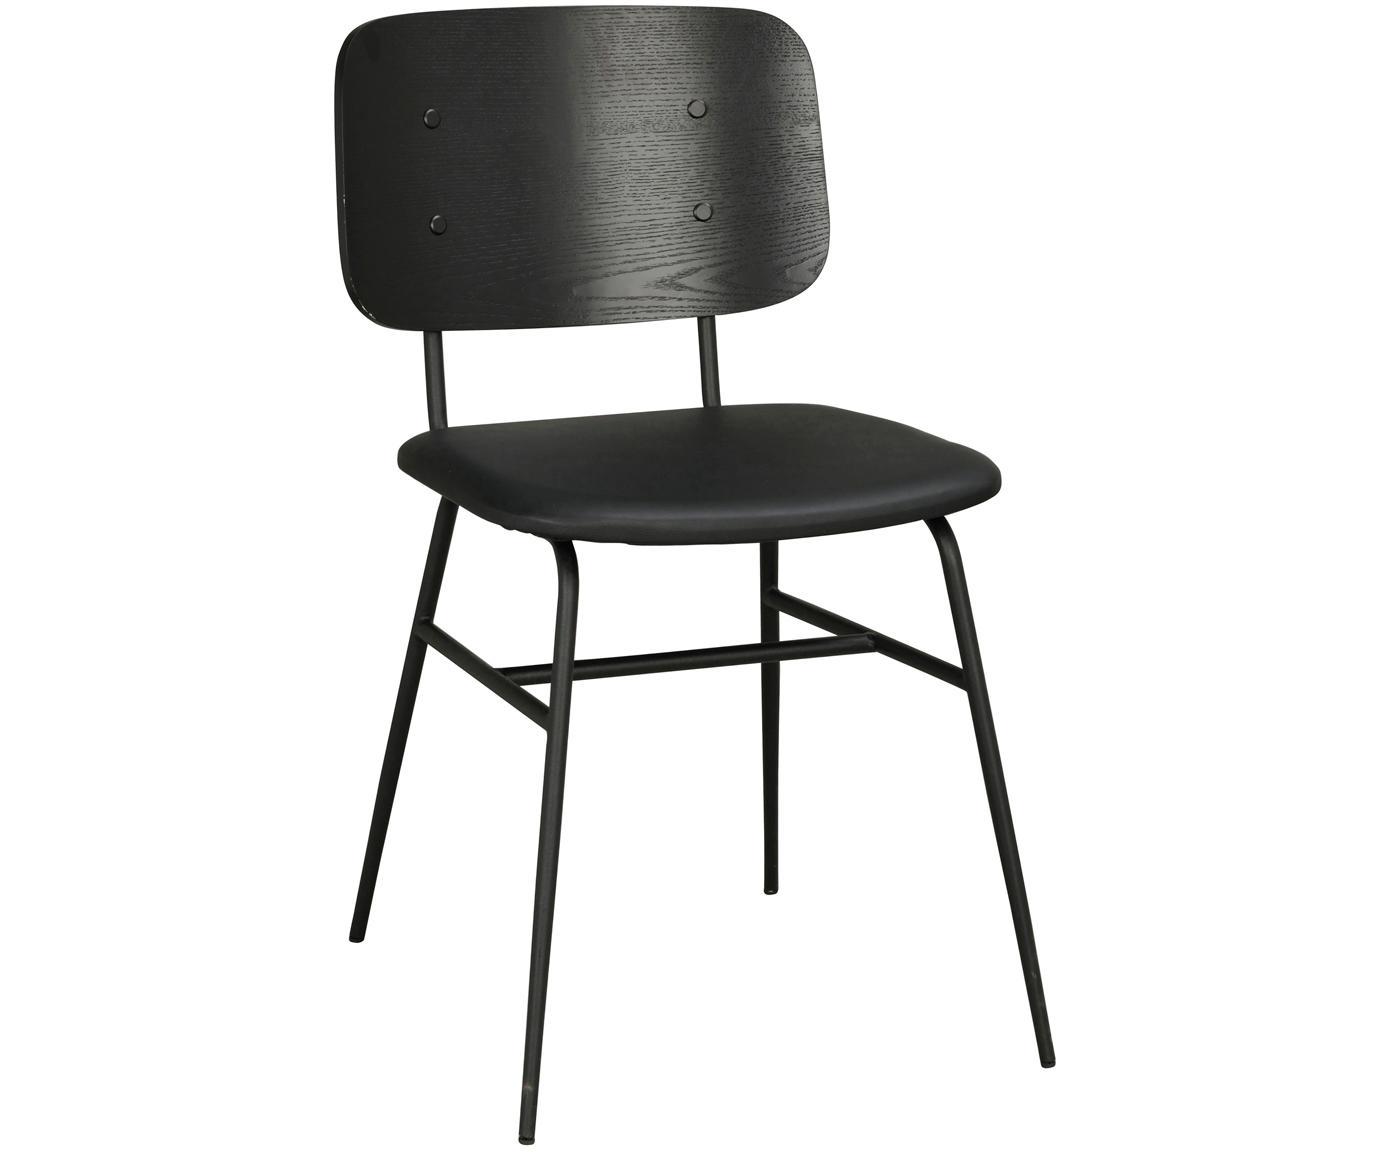 Silla de madera Brent, Asiento: cuero sintético (poliuret, Estructura: metal, pintado, Negro mate, An 47 x F 57 cm